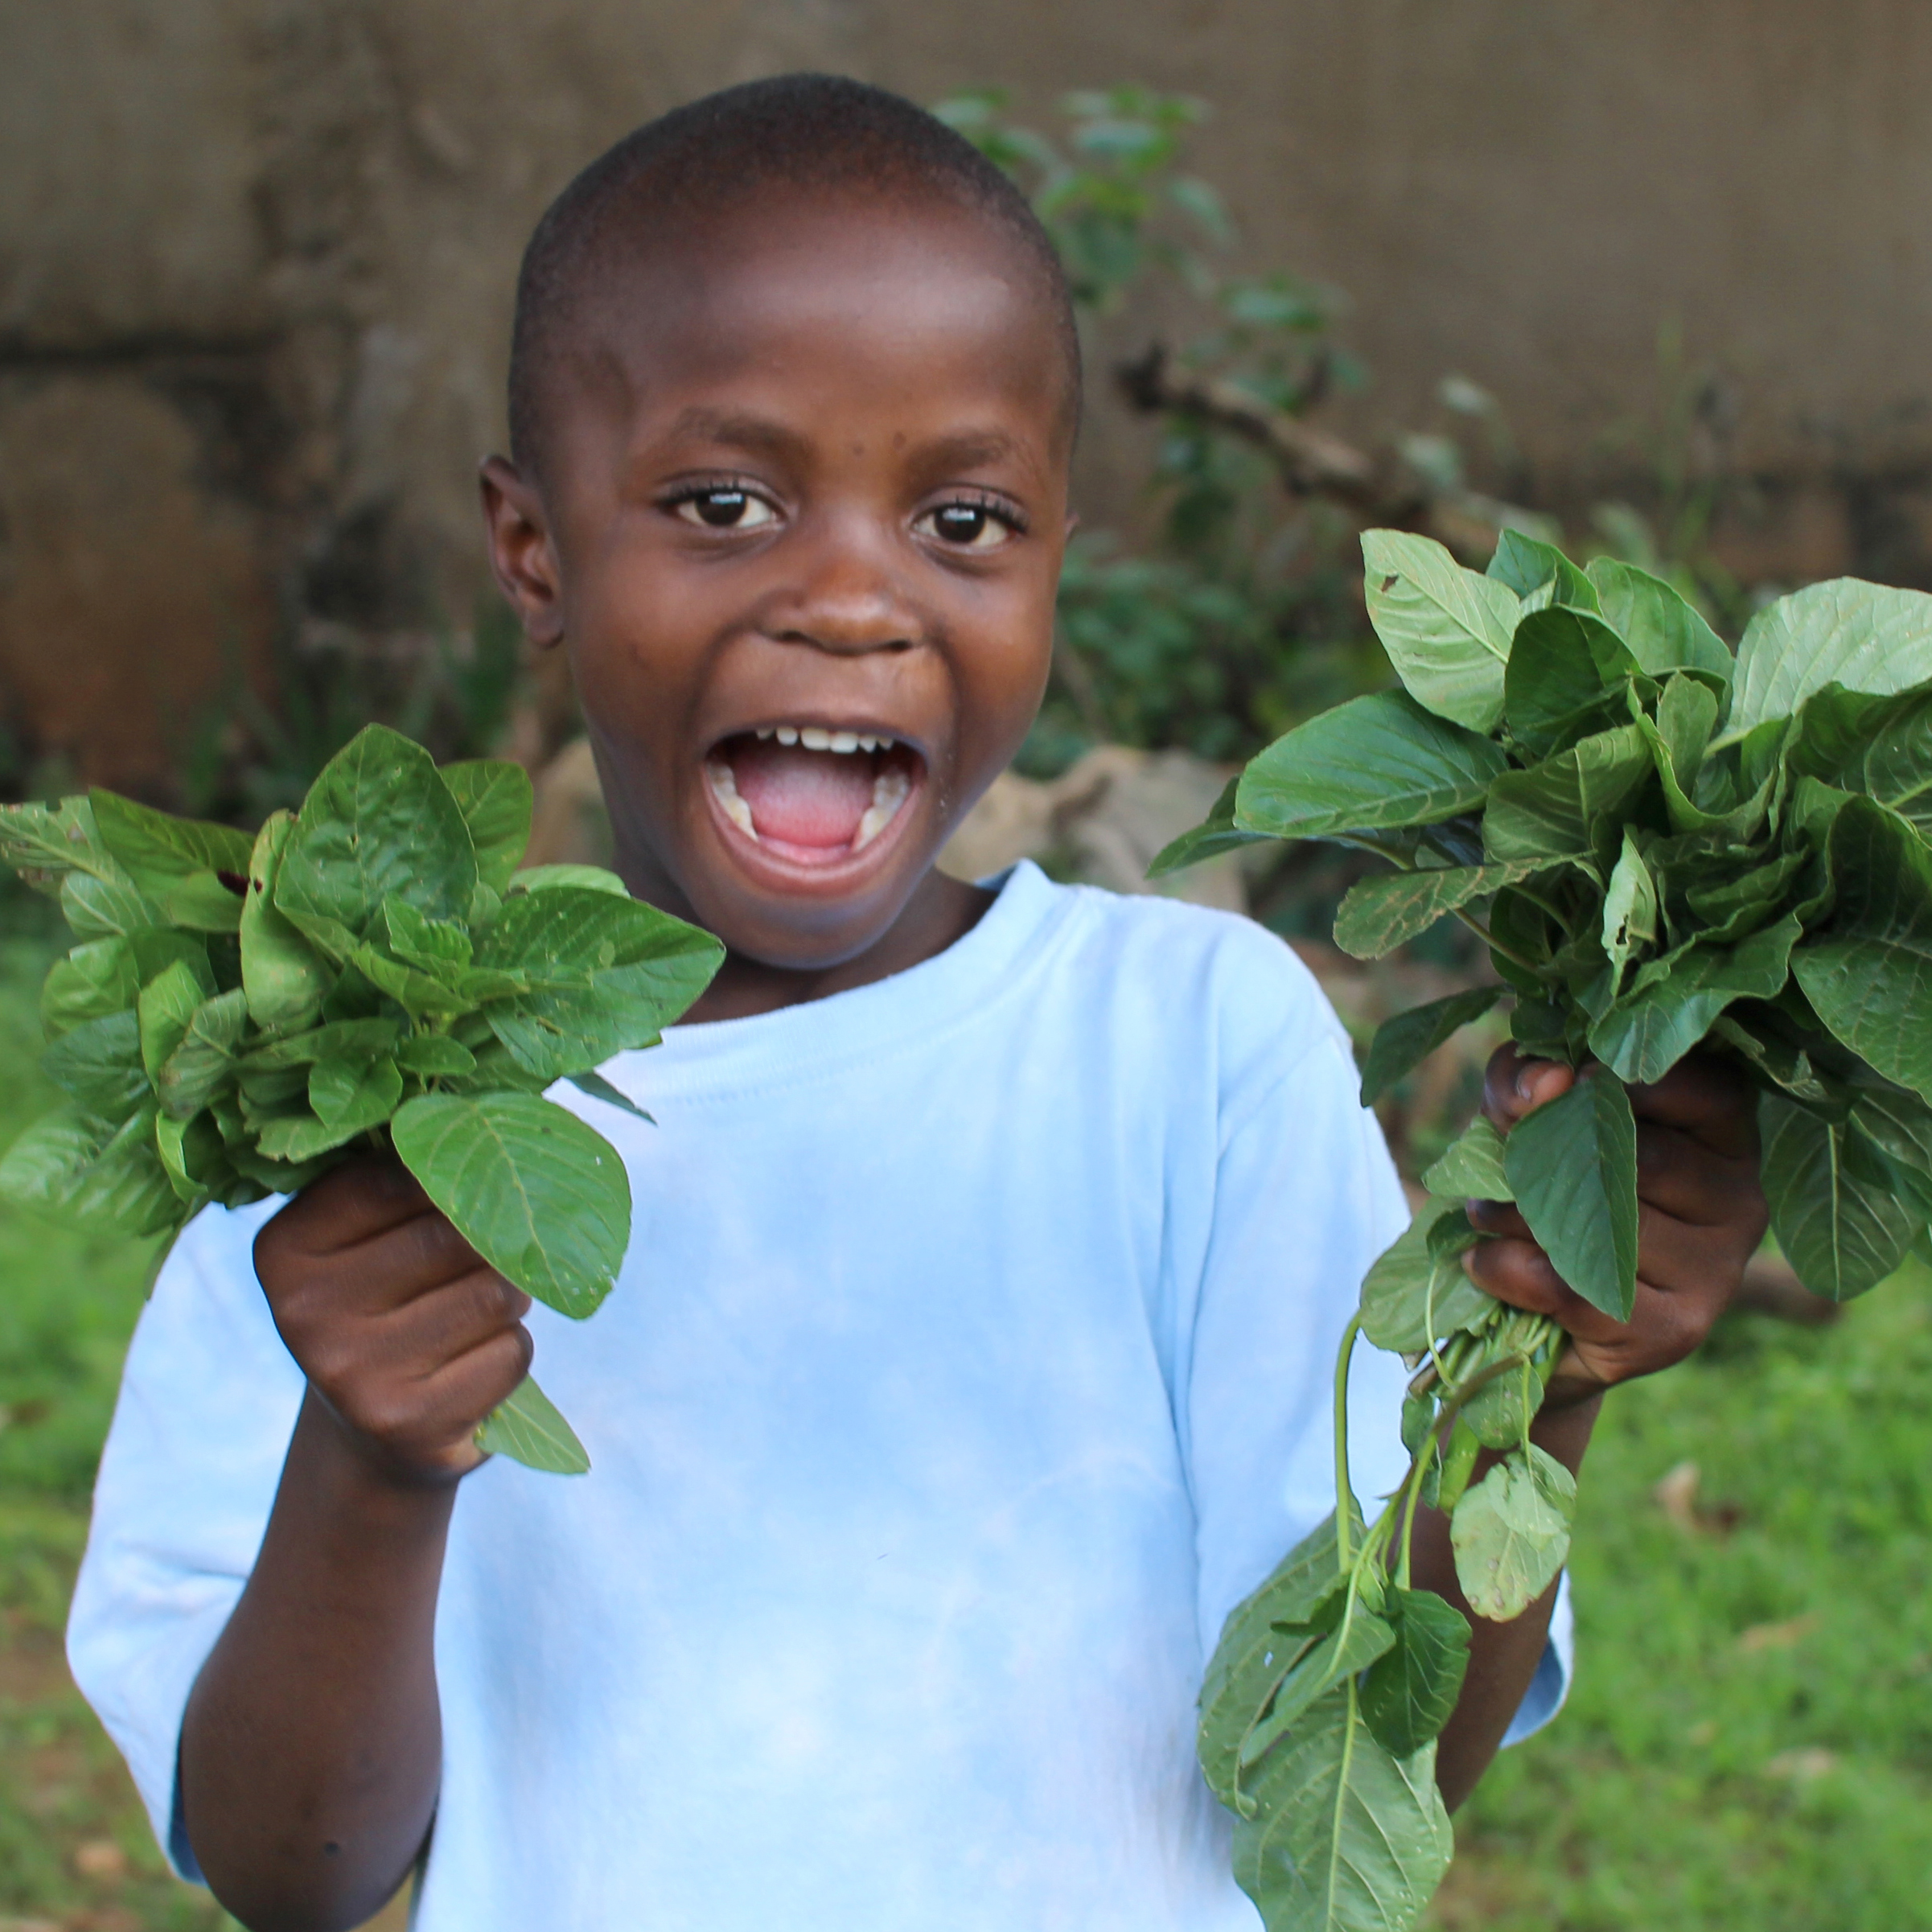 Awamu community gardens in Uganda